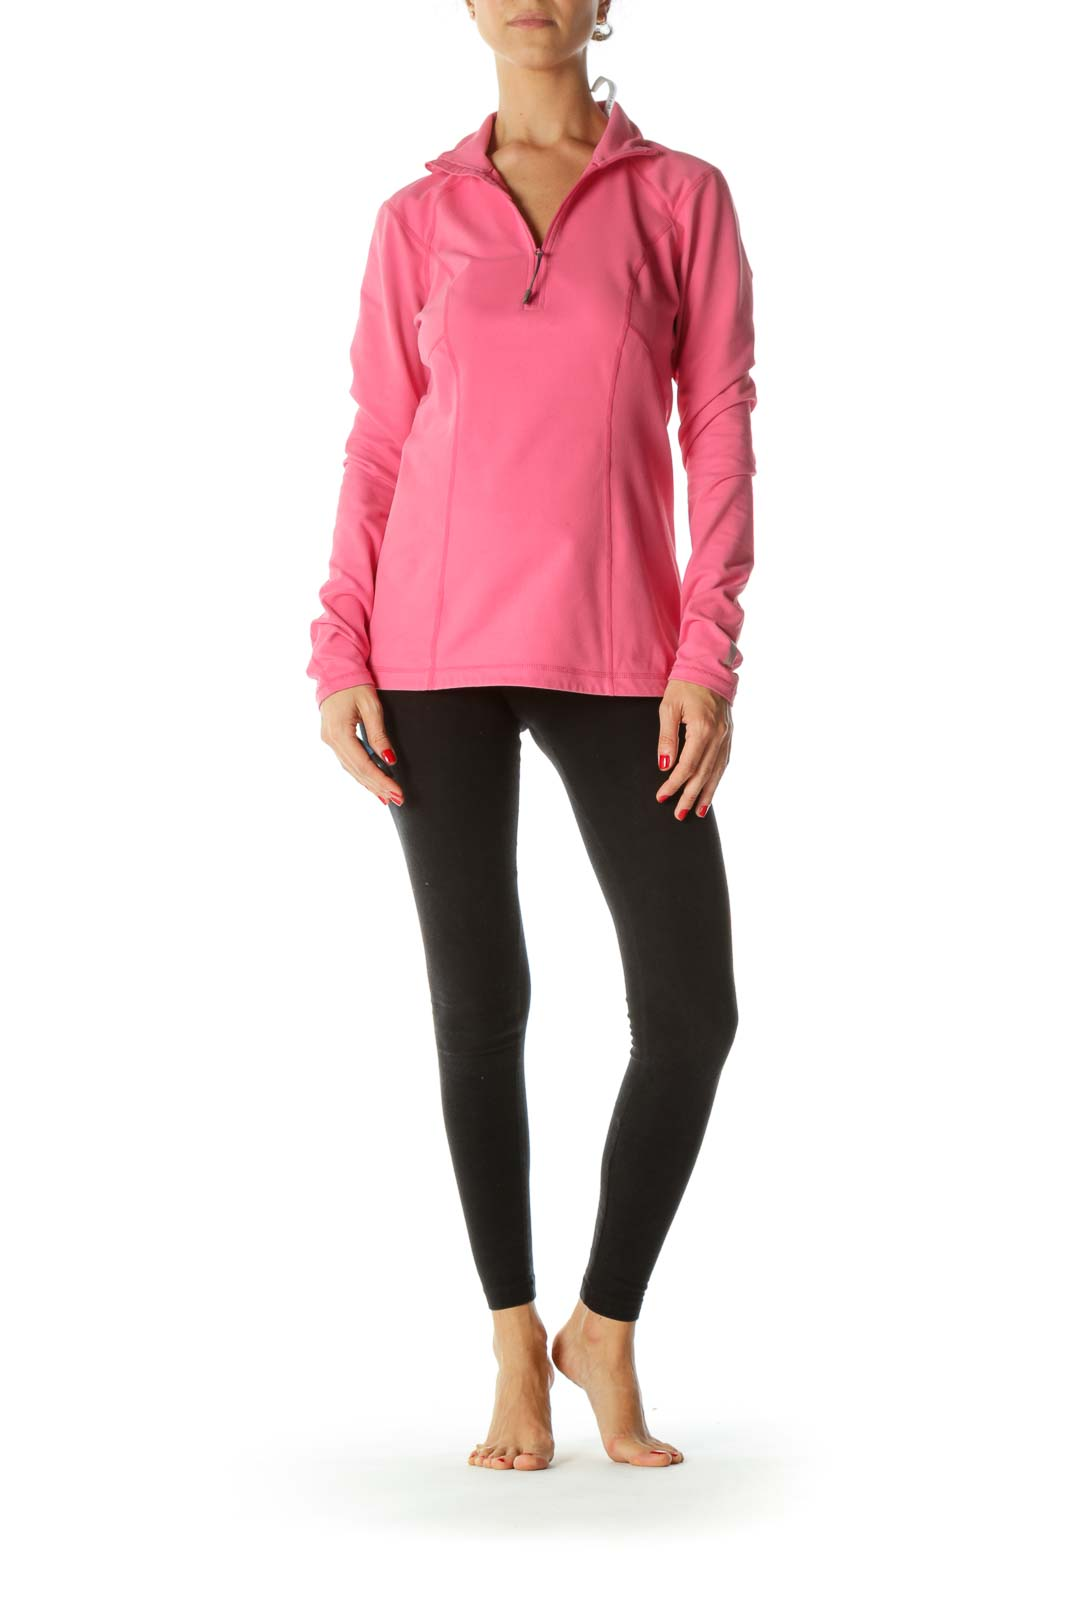 Pink Zippered Sport Long Sleeves Top